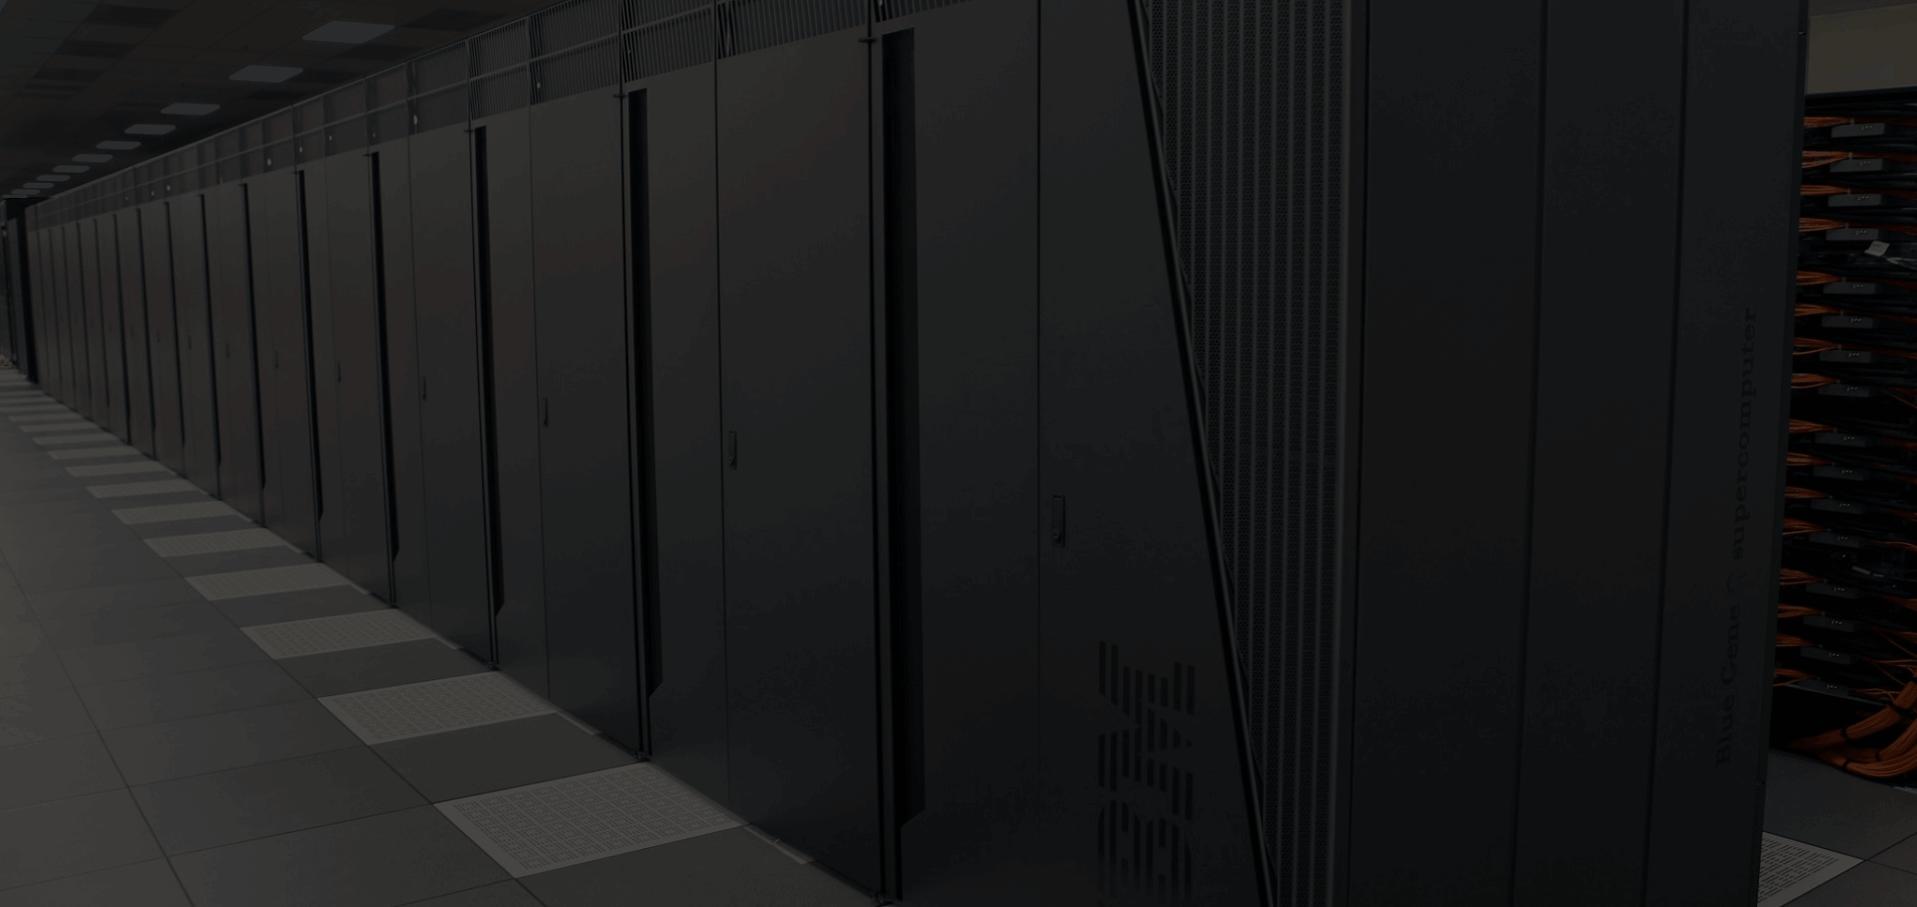 Виртуальные серверы